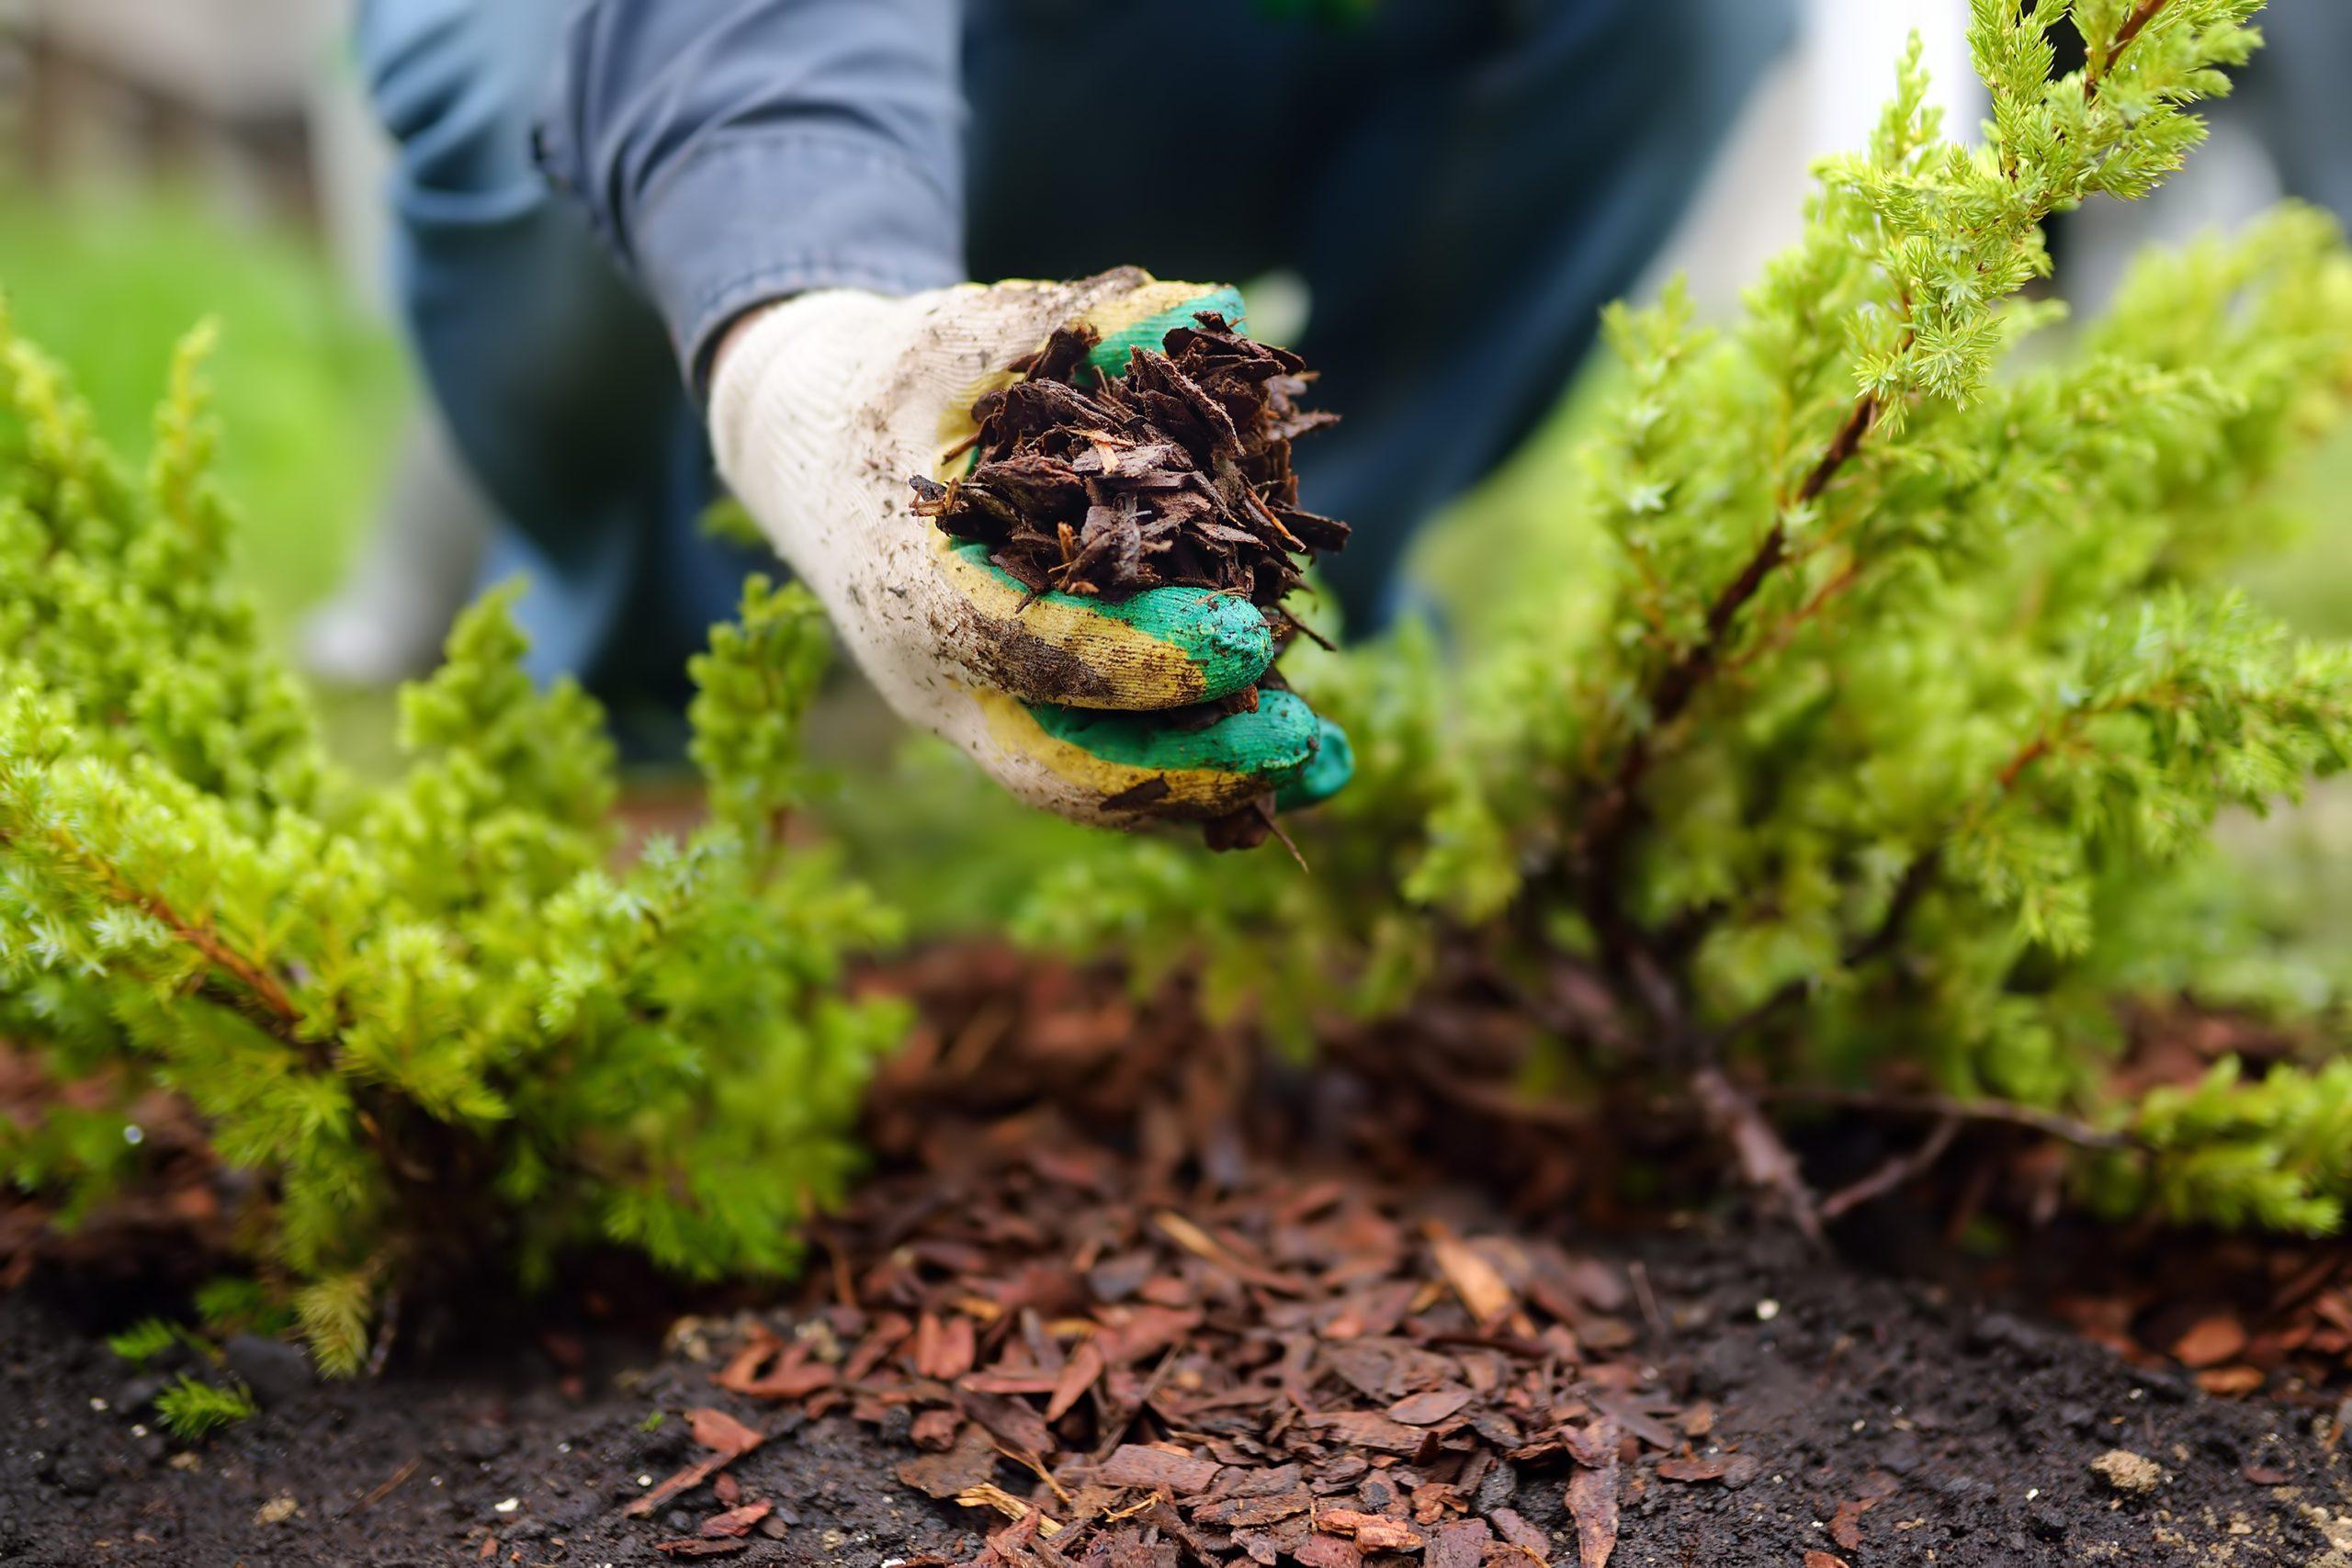 Gardener mulching with pine bark juniper plants in the yard. Seasonal works in the garden. Landscape design.